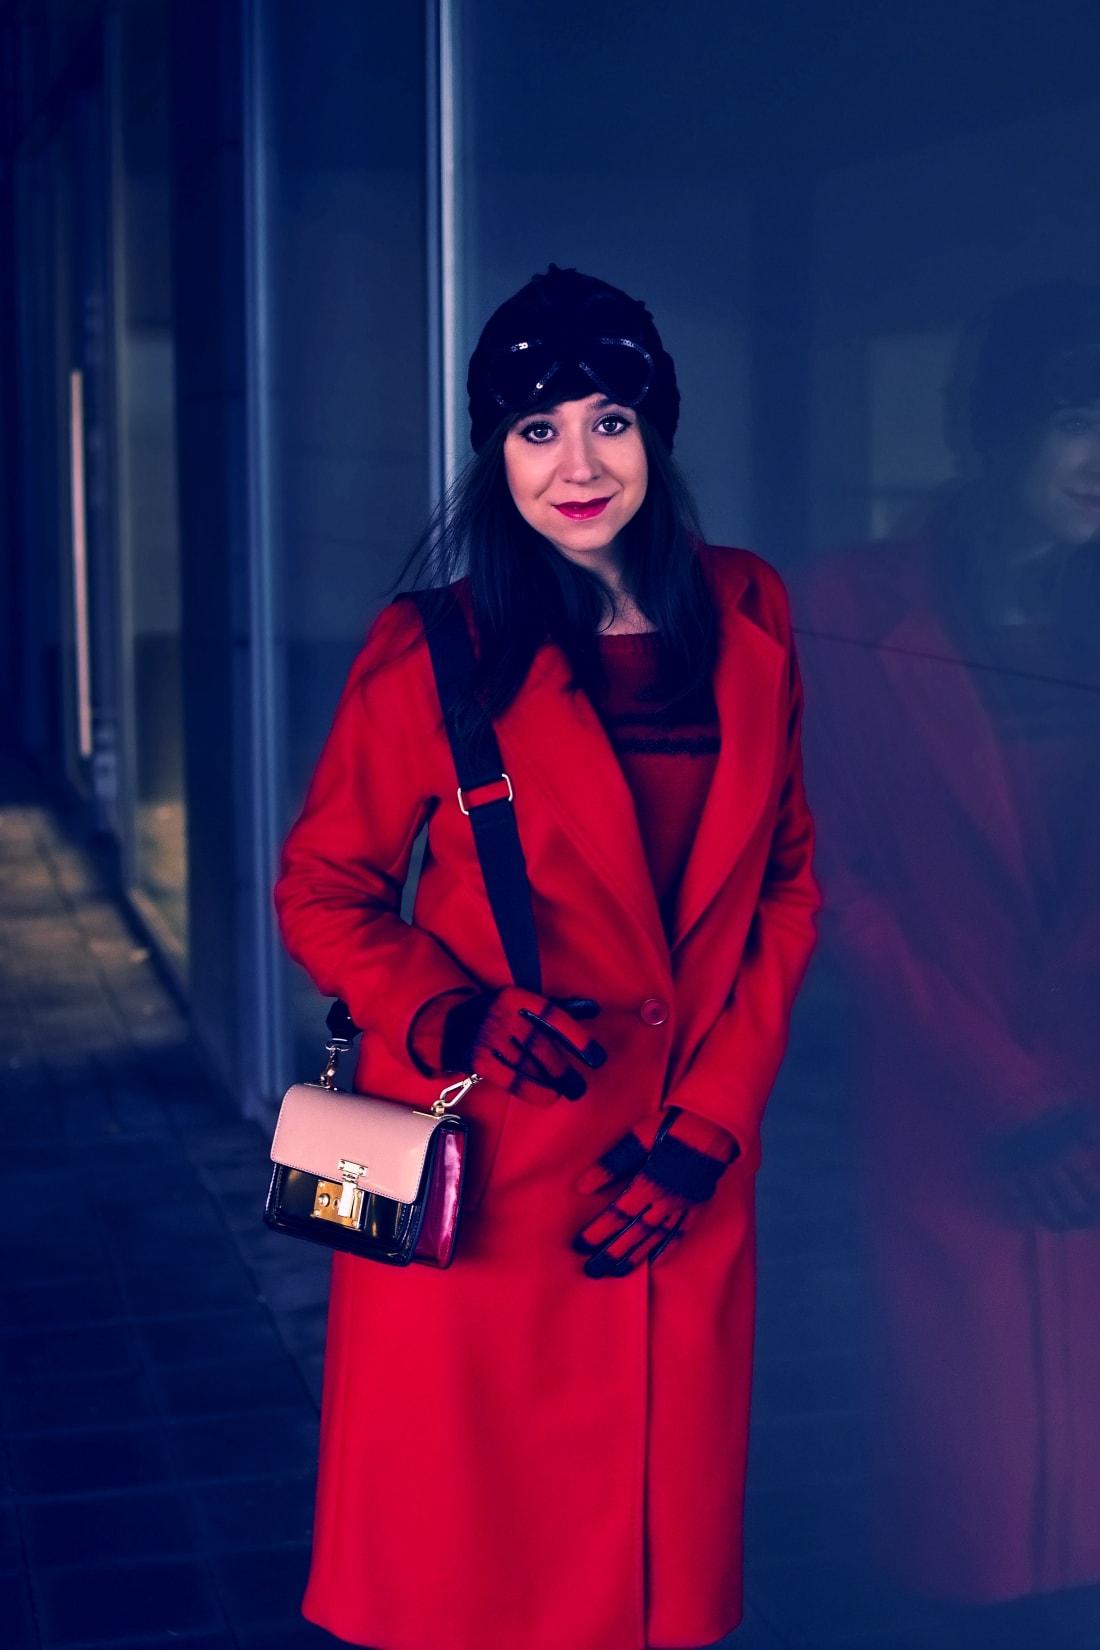 Prajem vám_Katharine-fashion is beautiful_Červený kabát Zara_Čierna sukňa_Katarína Jakubčová_Fashion blogger